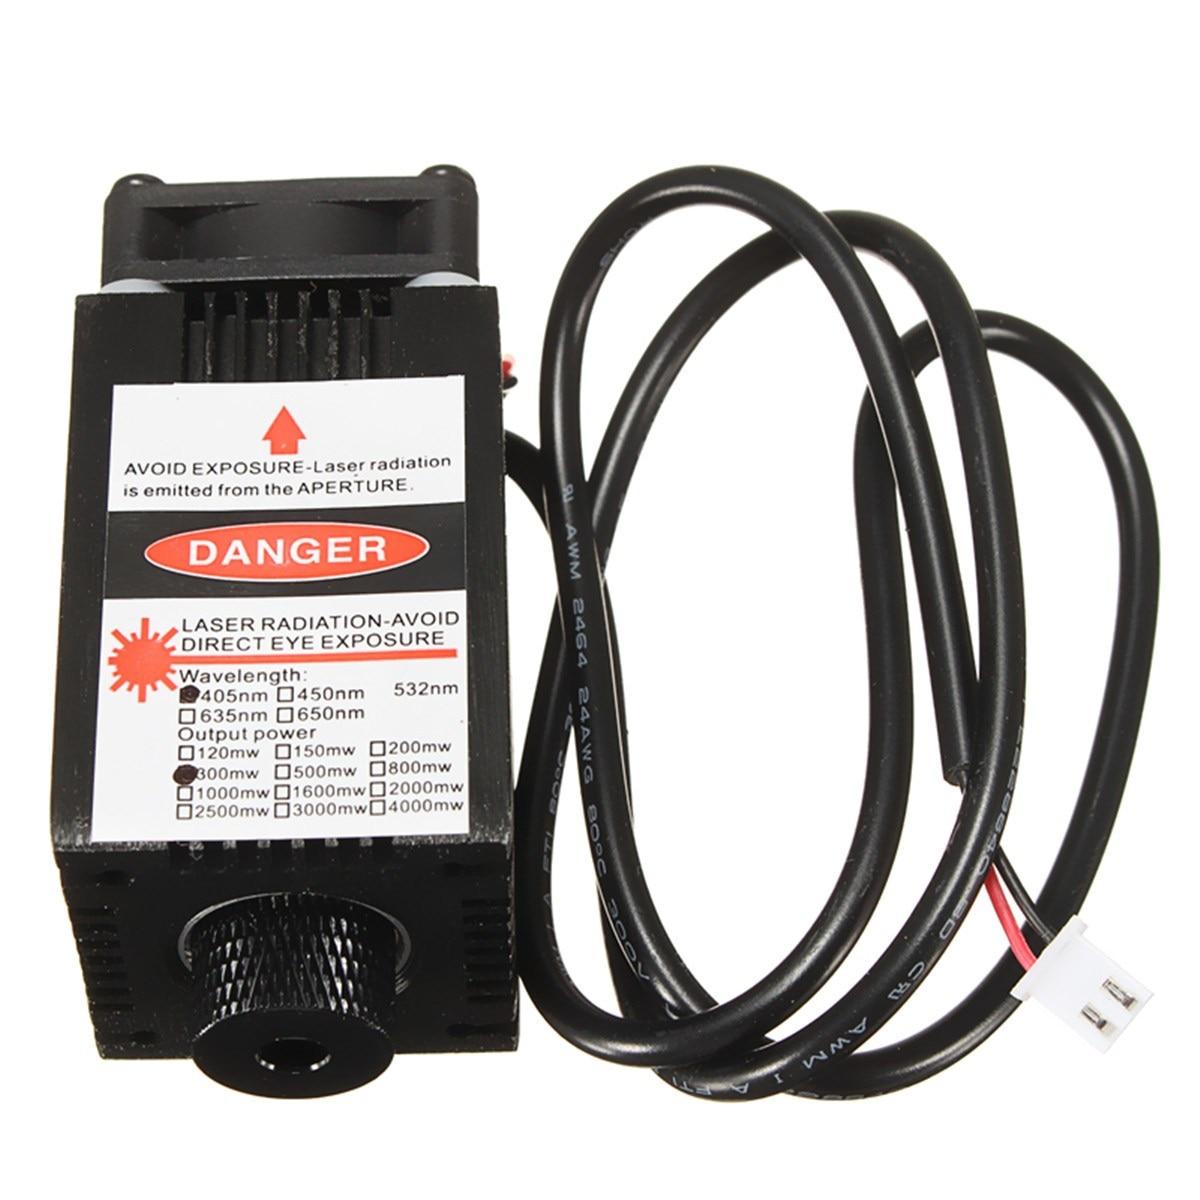 405nm 300mW Laser Engraving Machine Module For DIY Engraver пежо 405 масляный насос